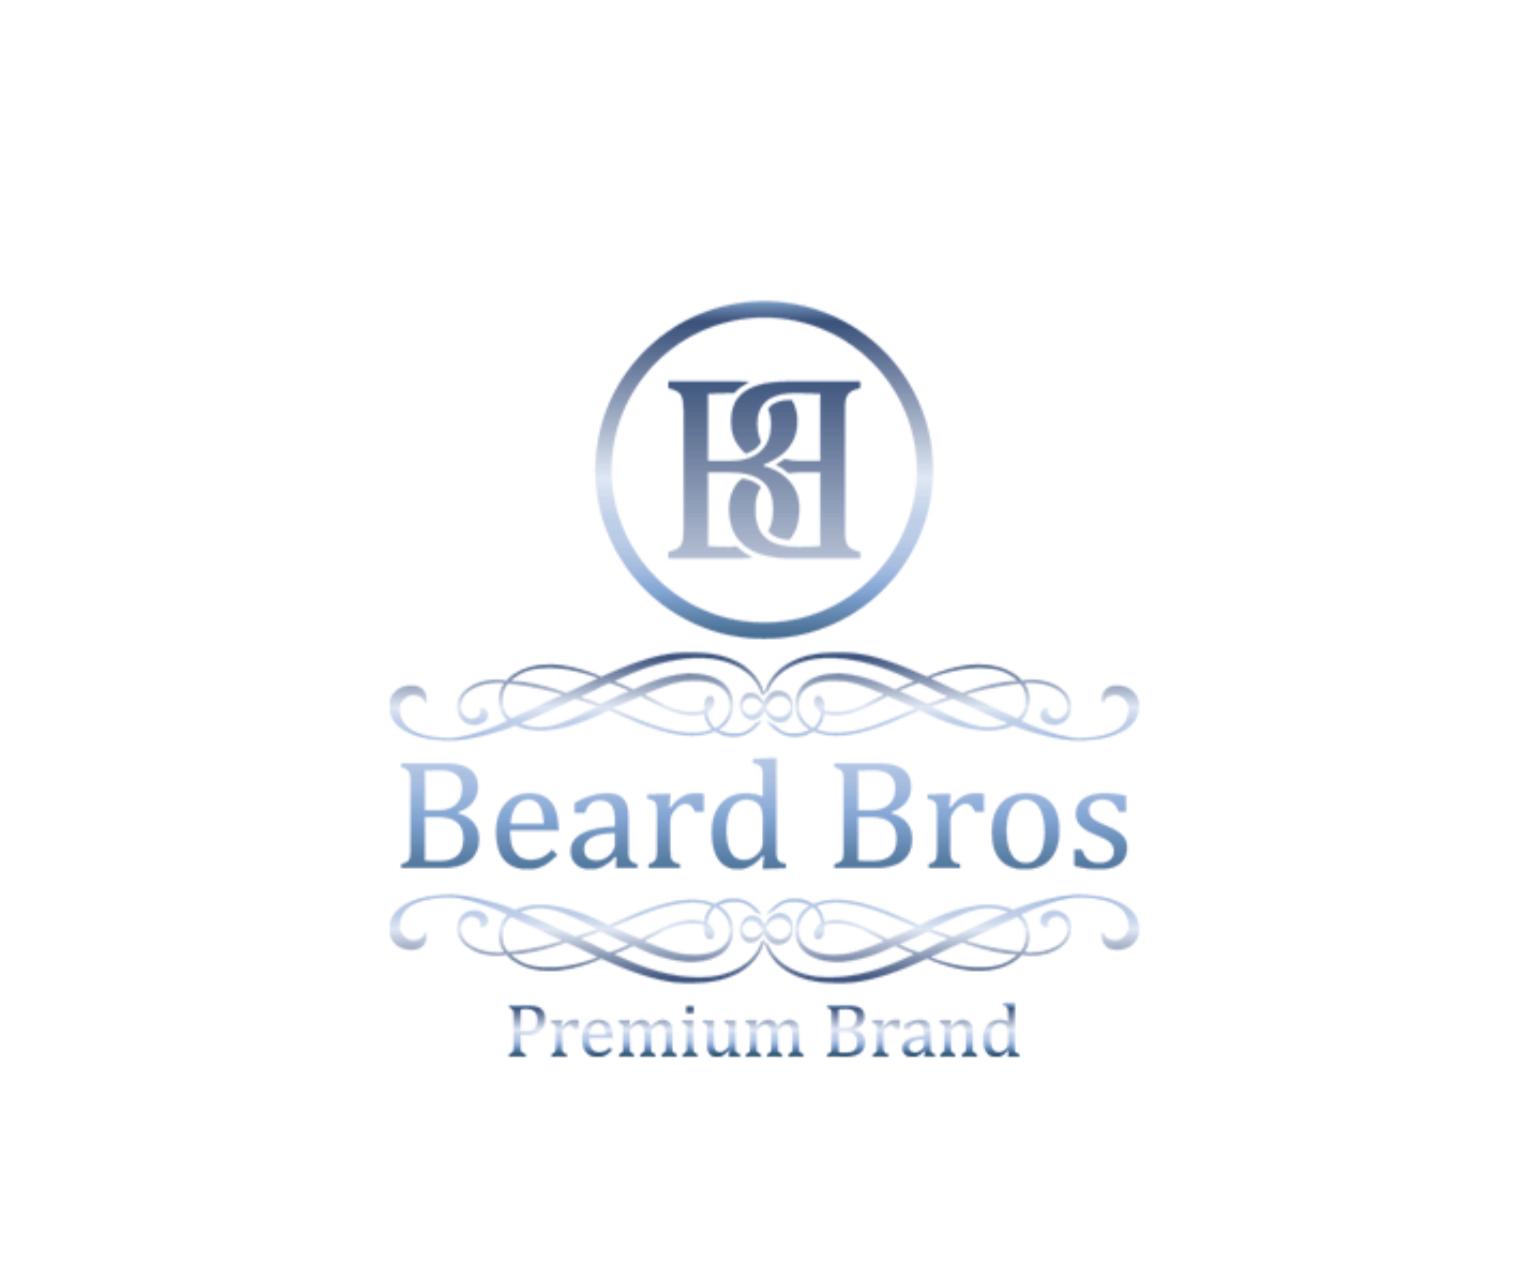 Logo by Tailored Logo - Beard Bros